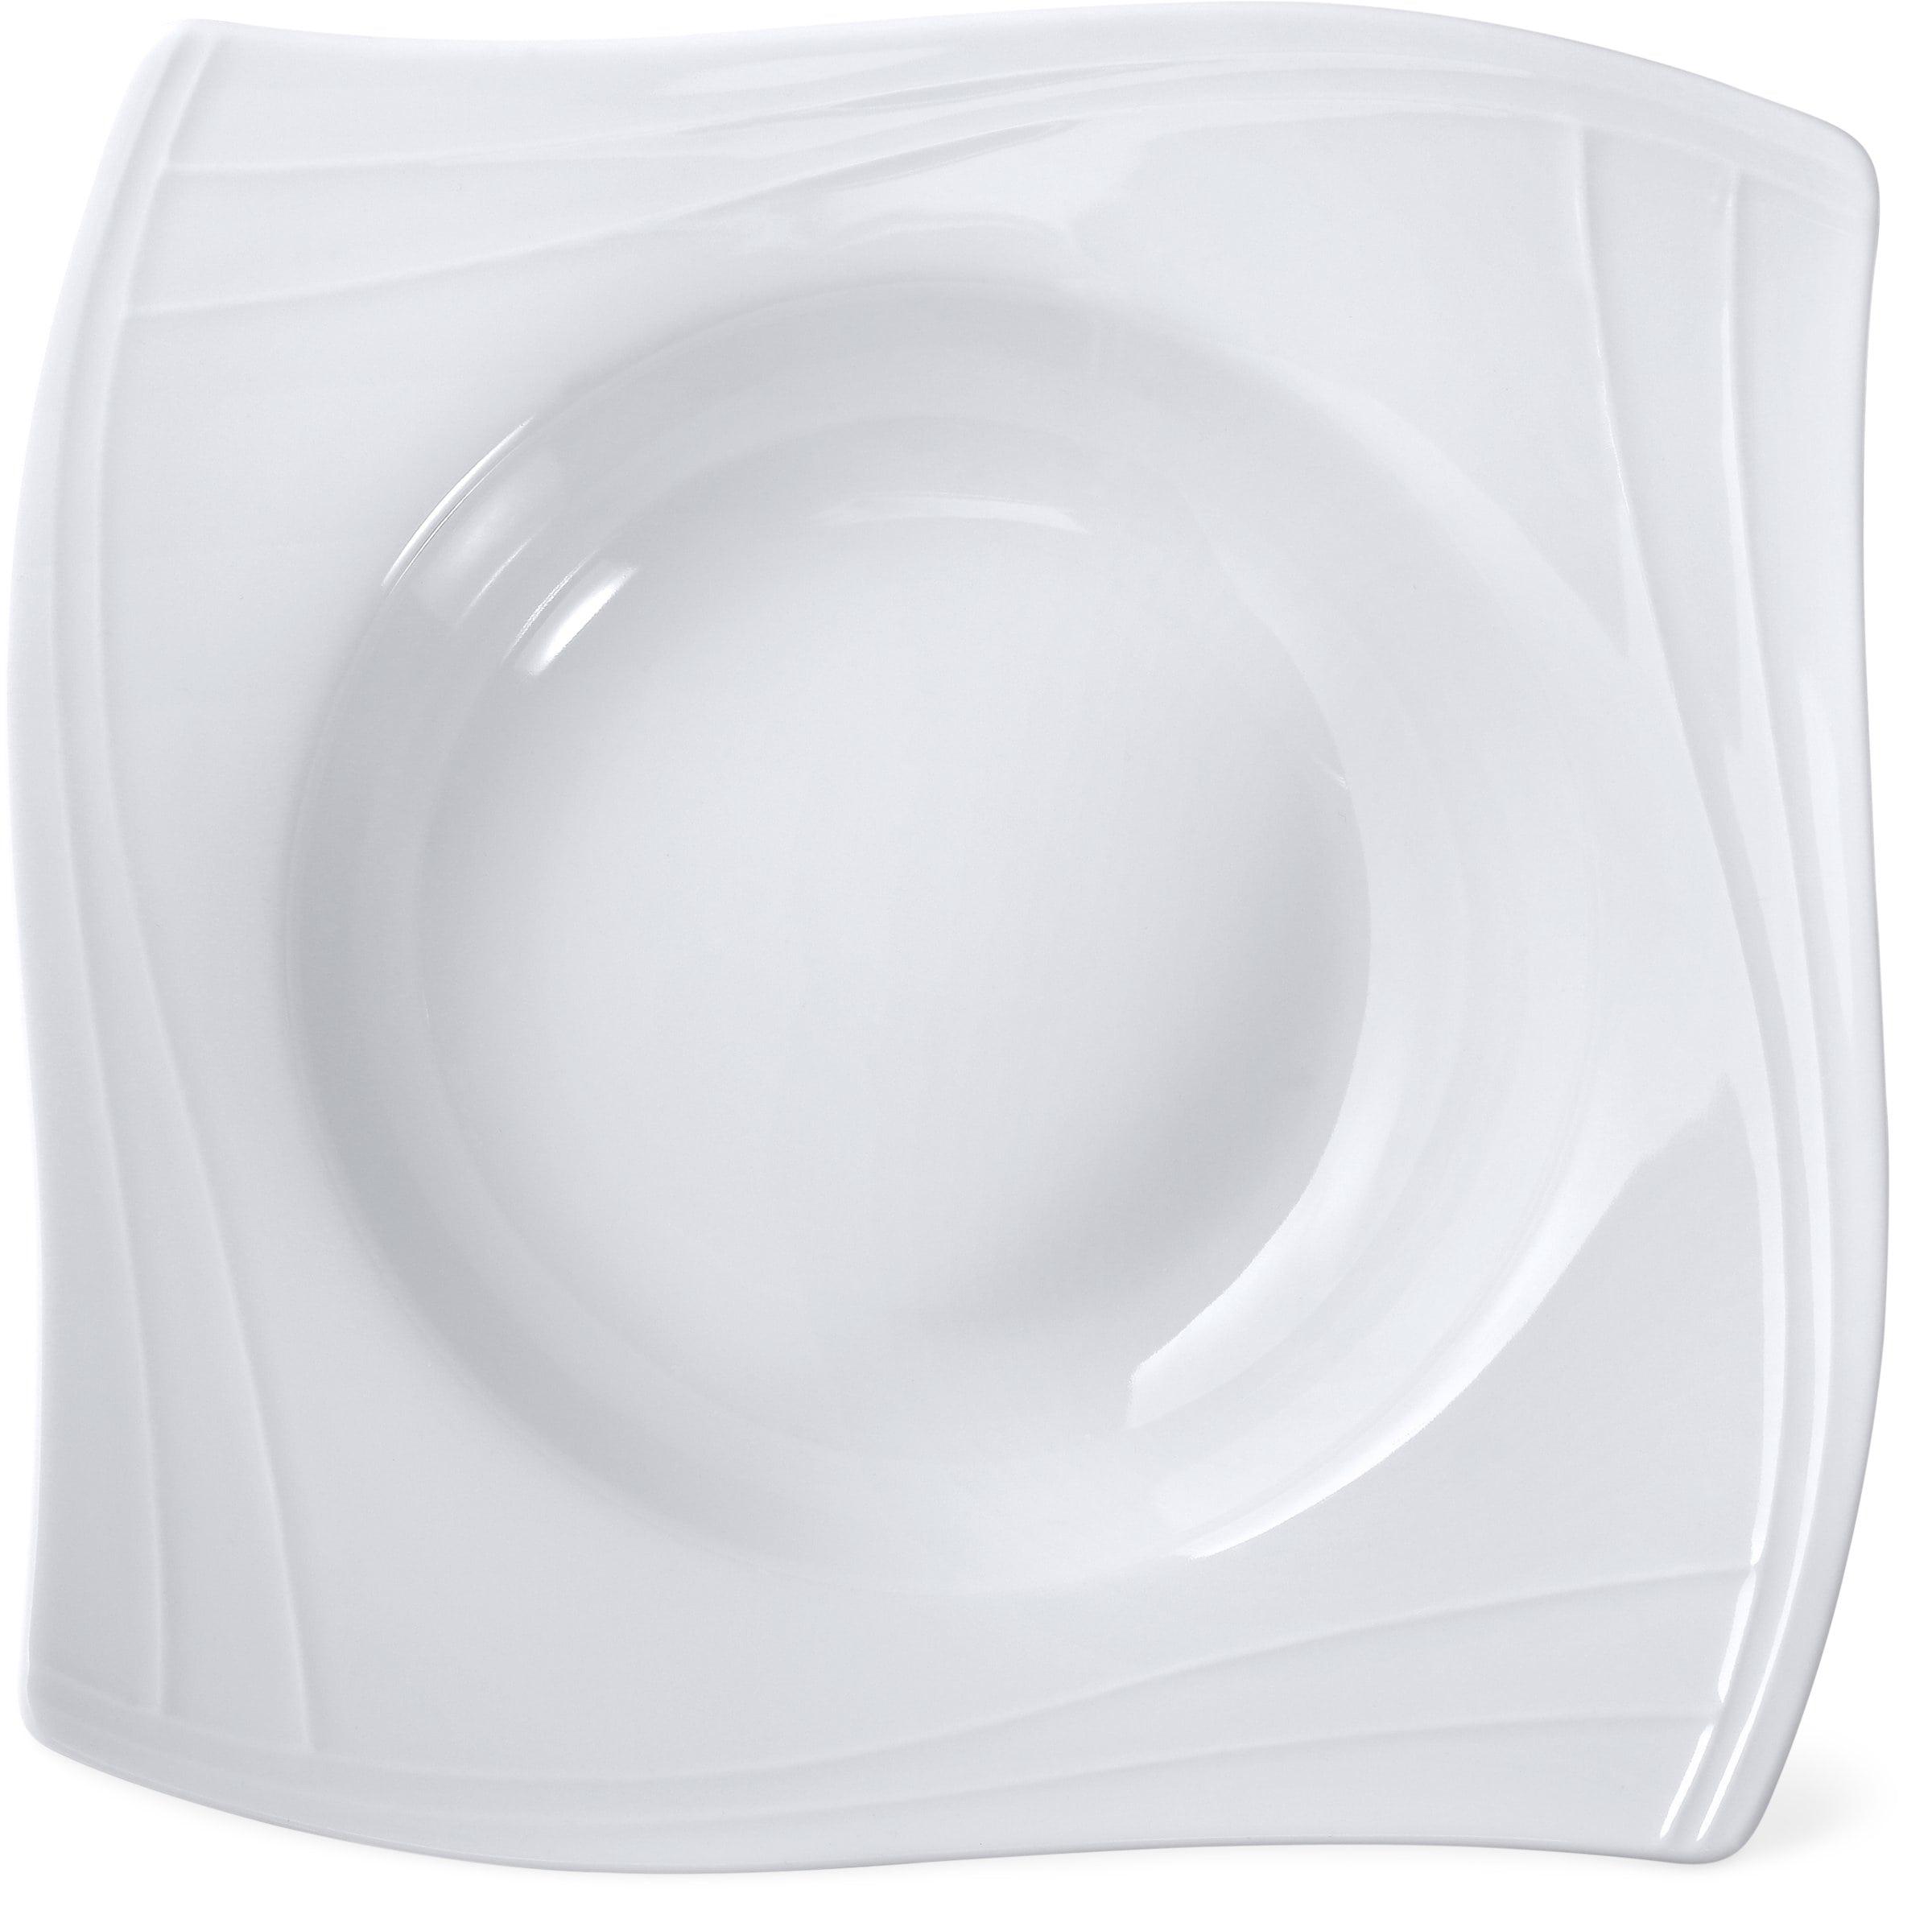 Cucina & Tavola VANITY Piatto per pasta